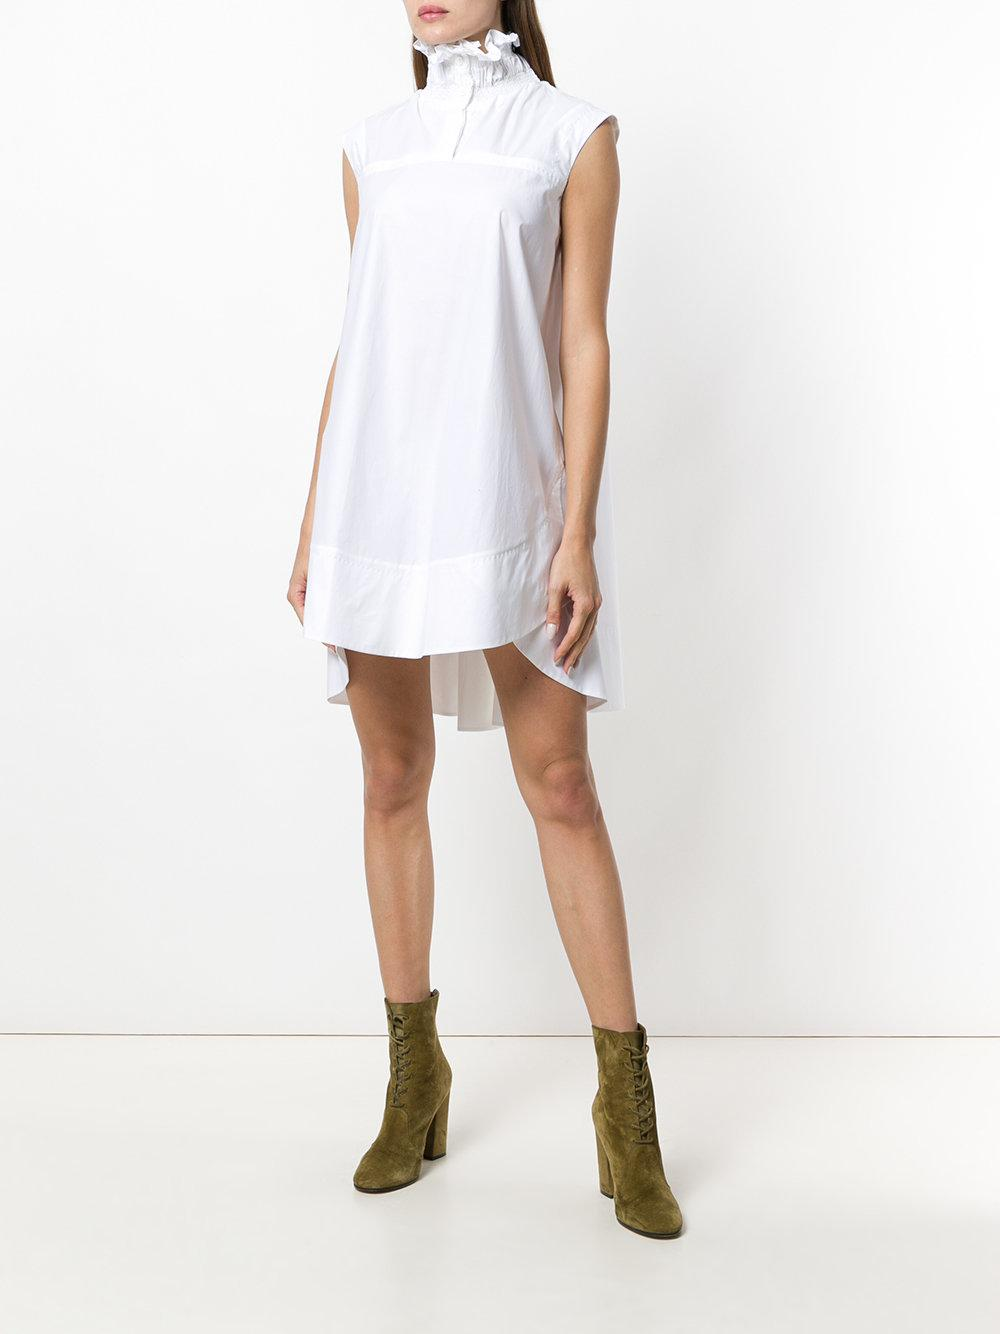 ruffled-collar asymmetri mini dress - White Carven NtrpeaJiYw